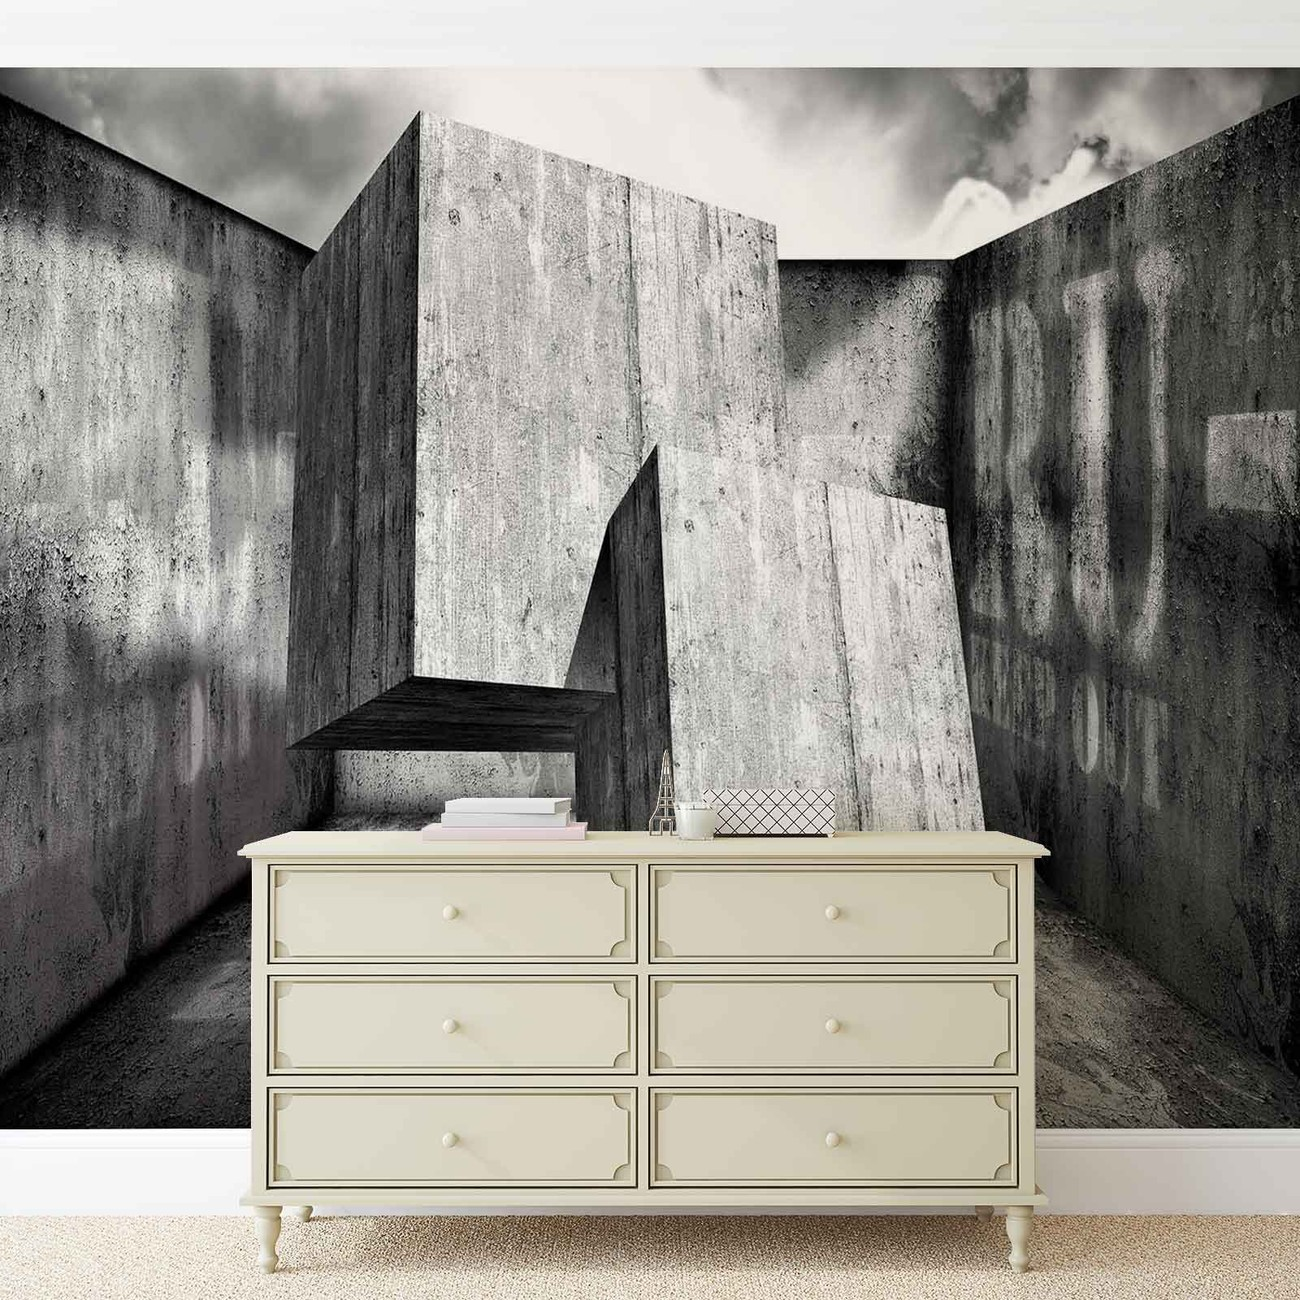 fototapete tapete abstrakt modern beton quadrate bei. Black Bedroom Furniture Sets. Home Design Ideas